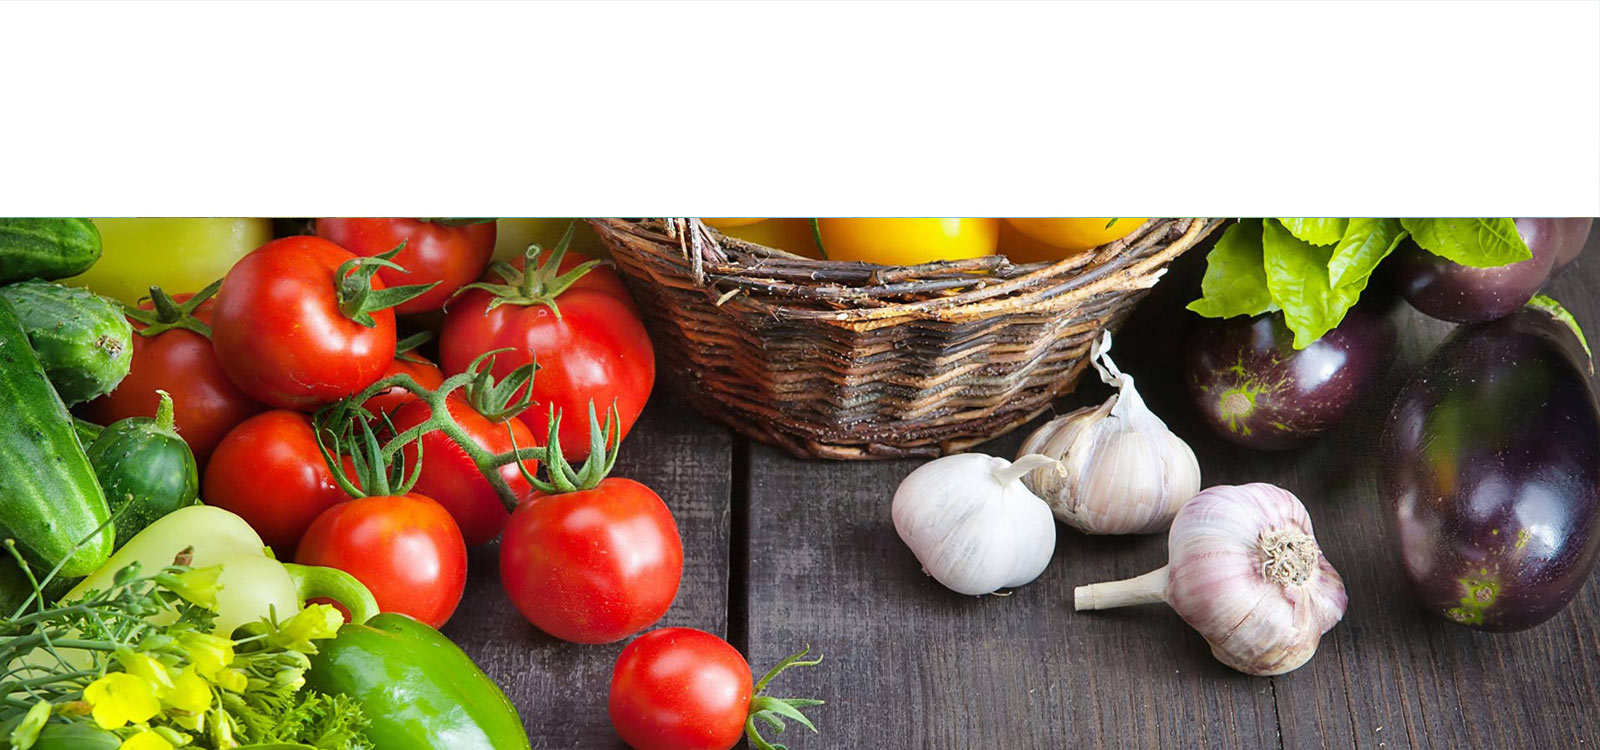 Alfa Catering - πάντα φρέσκα λαχανικά και φρούτα